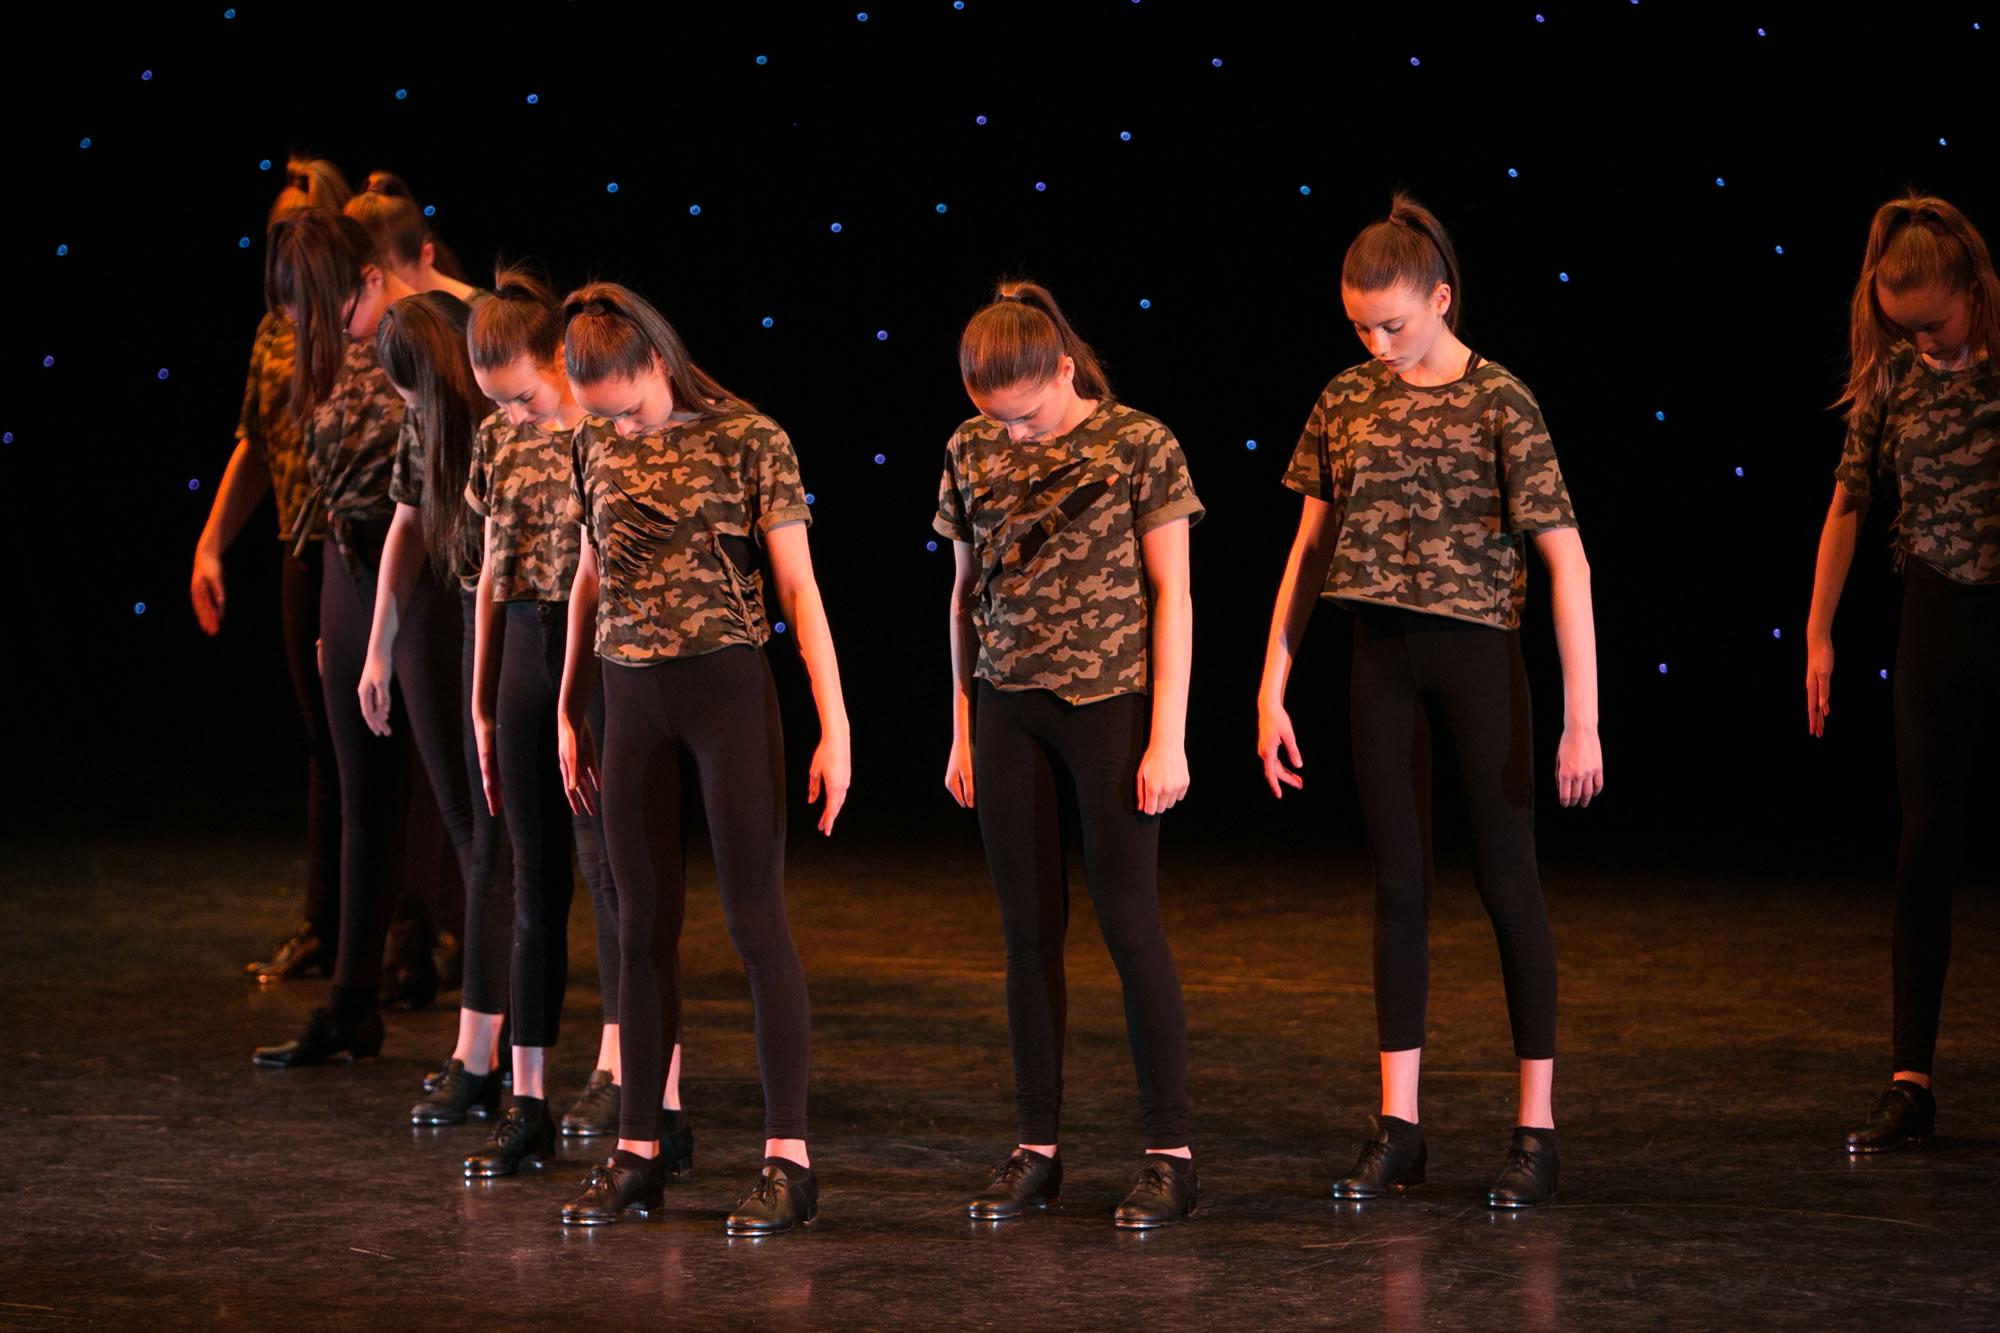 Hitchin_School_of_Dance_Show_2019-SM1_3225.jpg